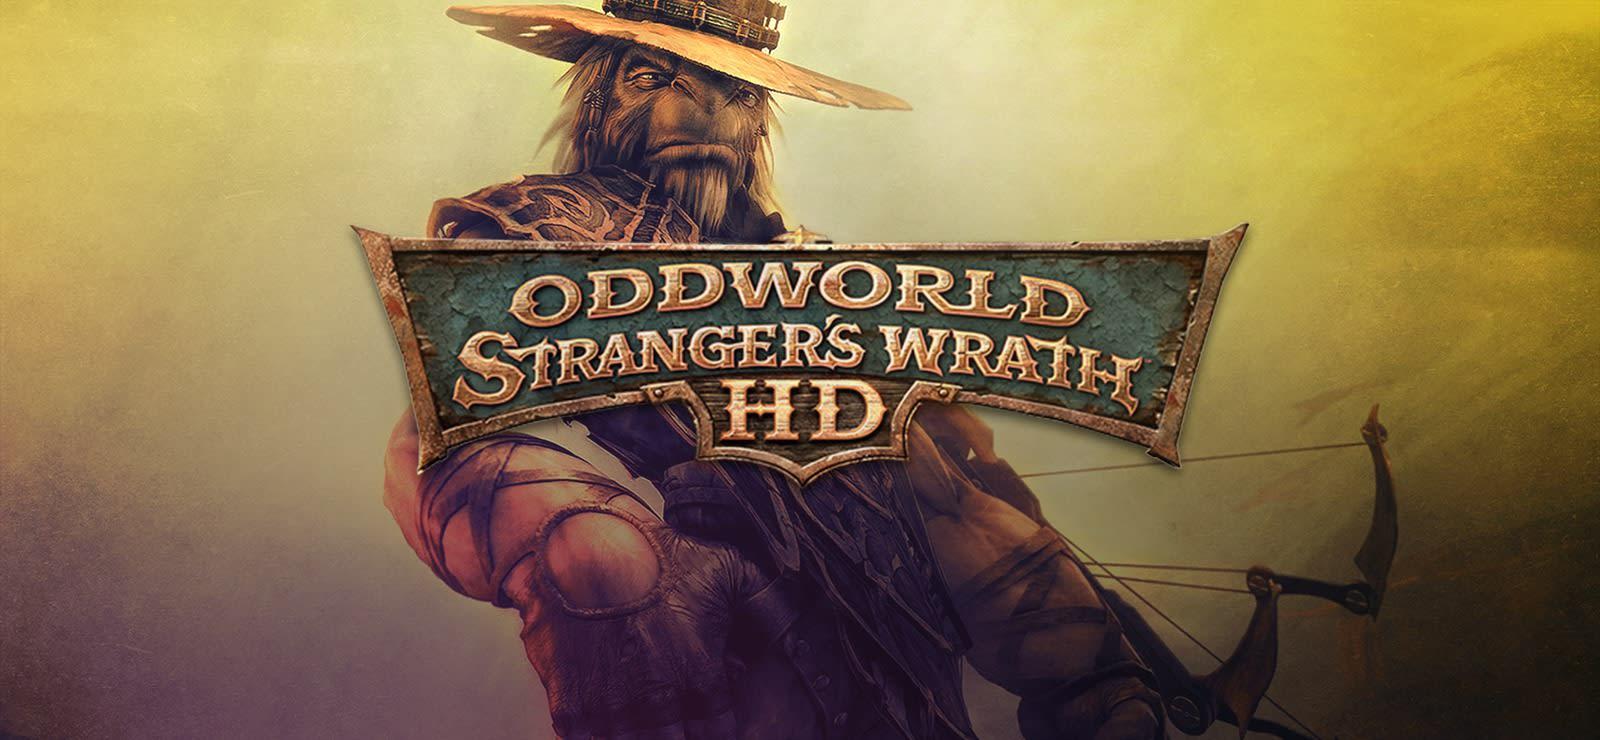 Oddworld: Stranger'S Wrath Hd varies-with-device